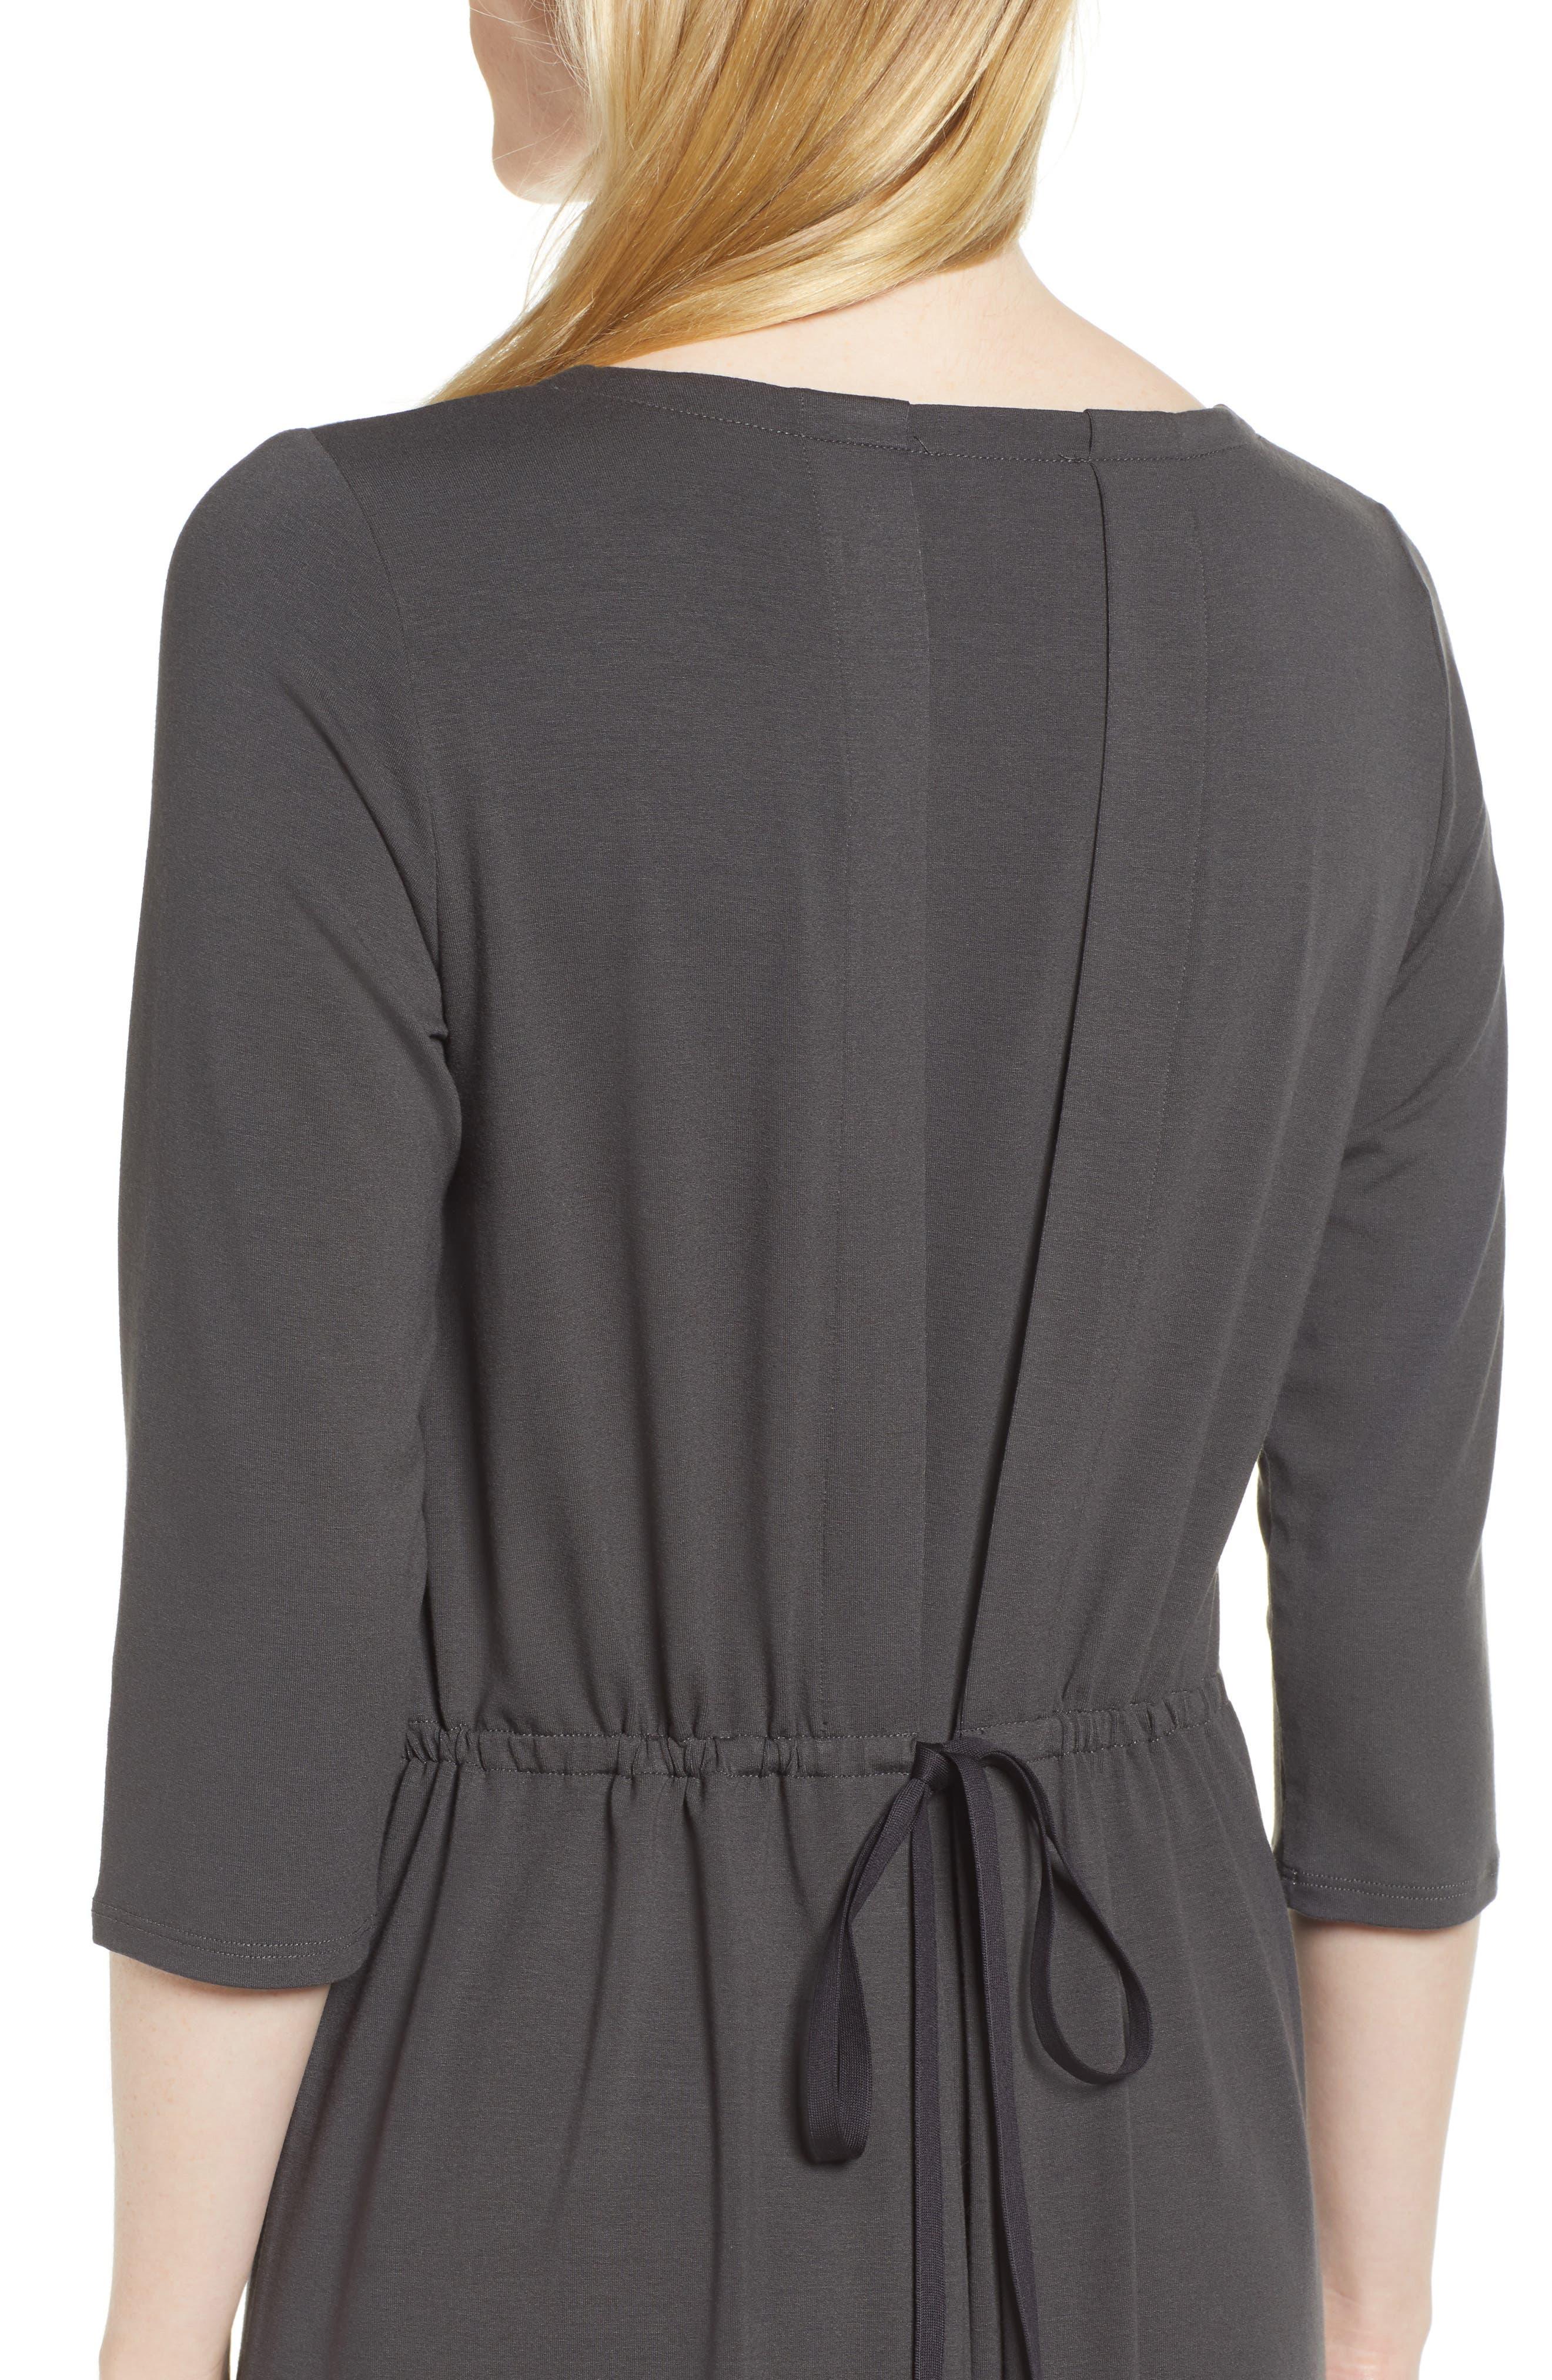 Tie Back Dress,                             Alternate thumbnail 4, color,                             025